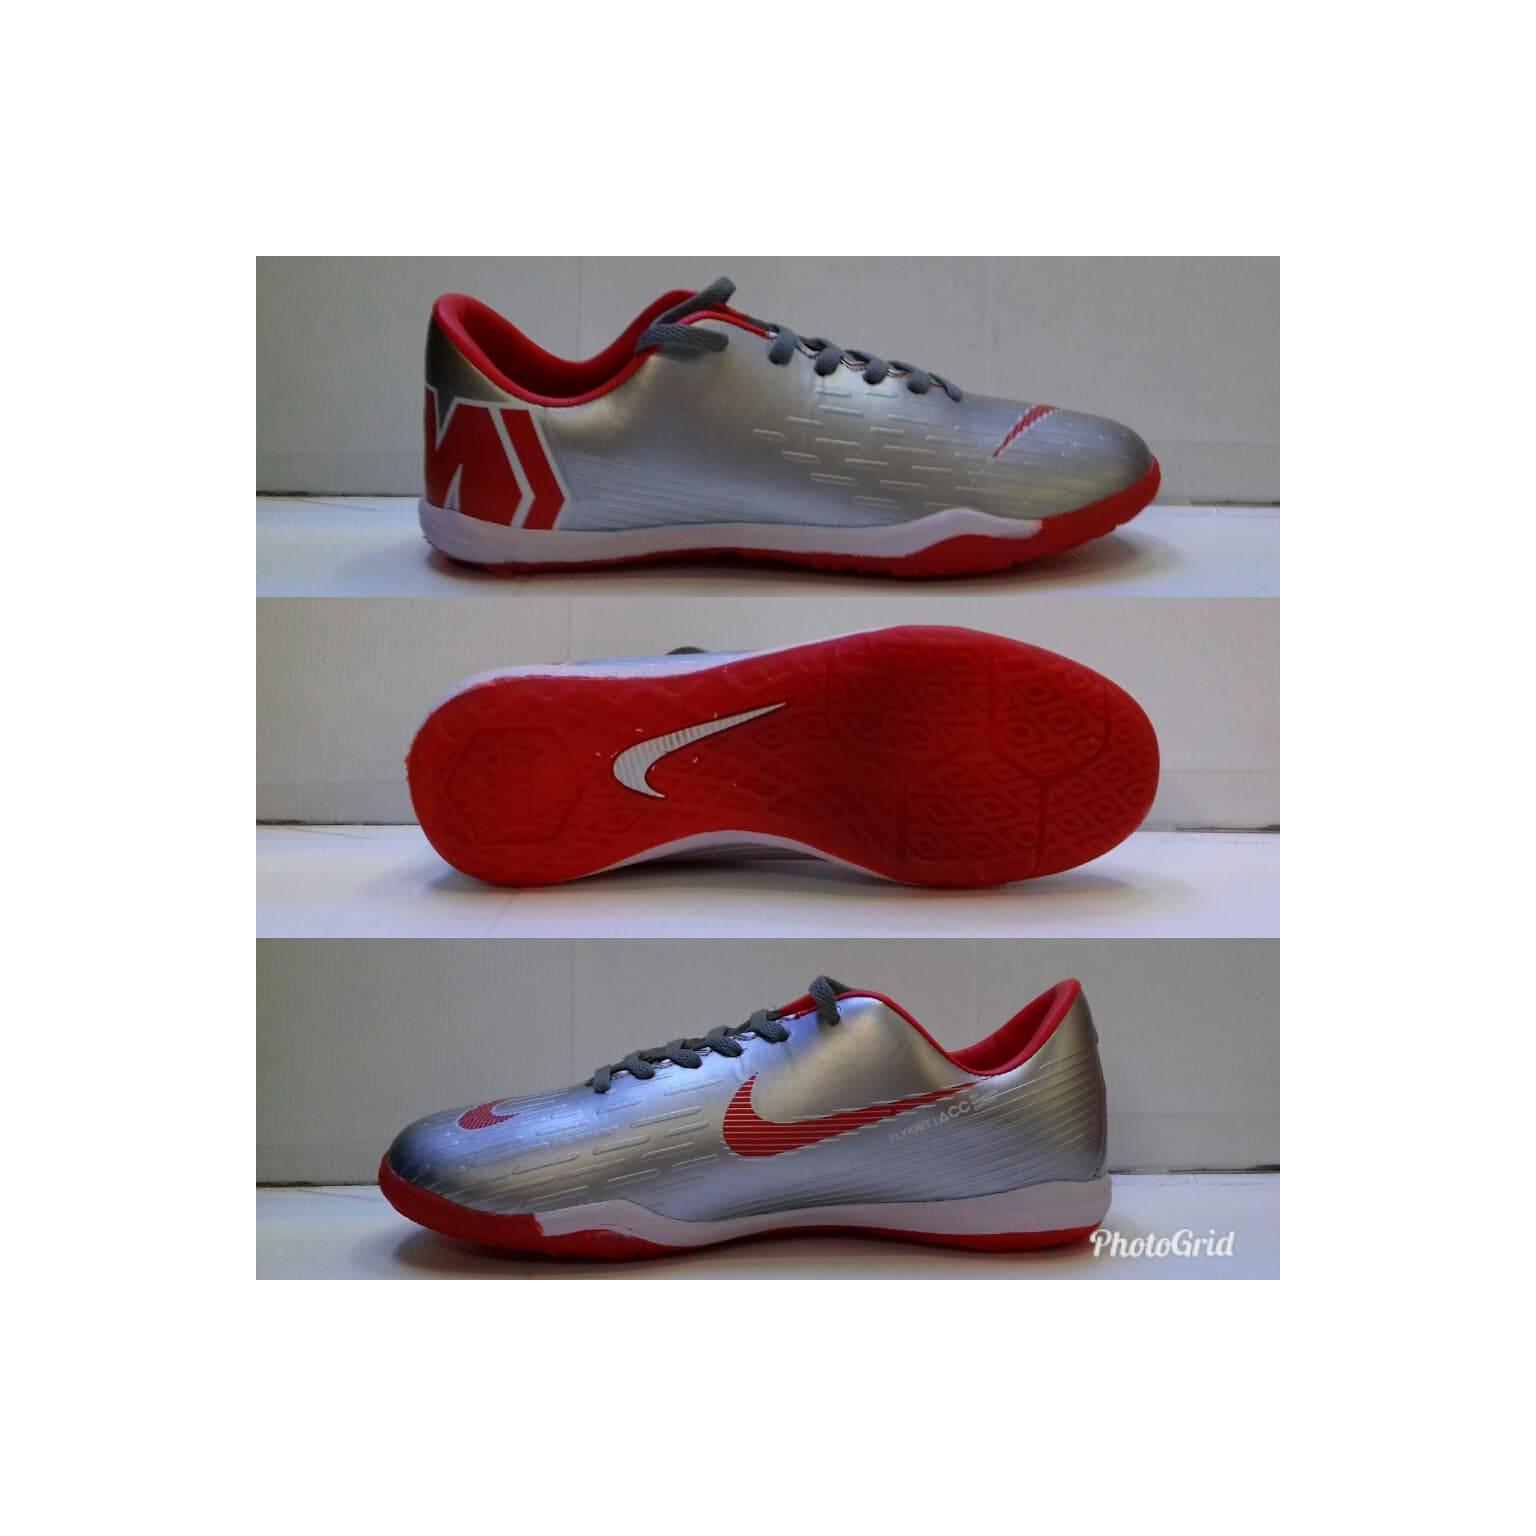 sepatu futsal Nike mercurial enginereed silver list merah sol karet